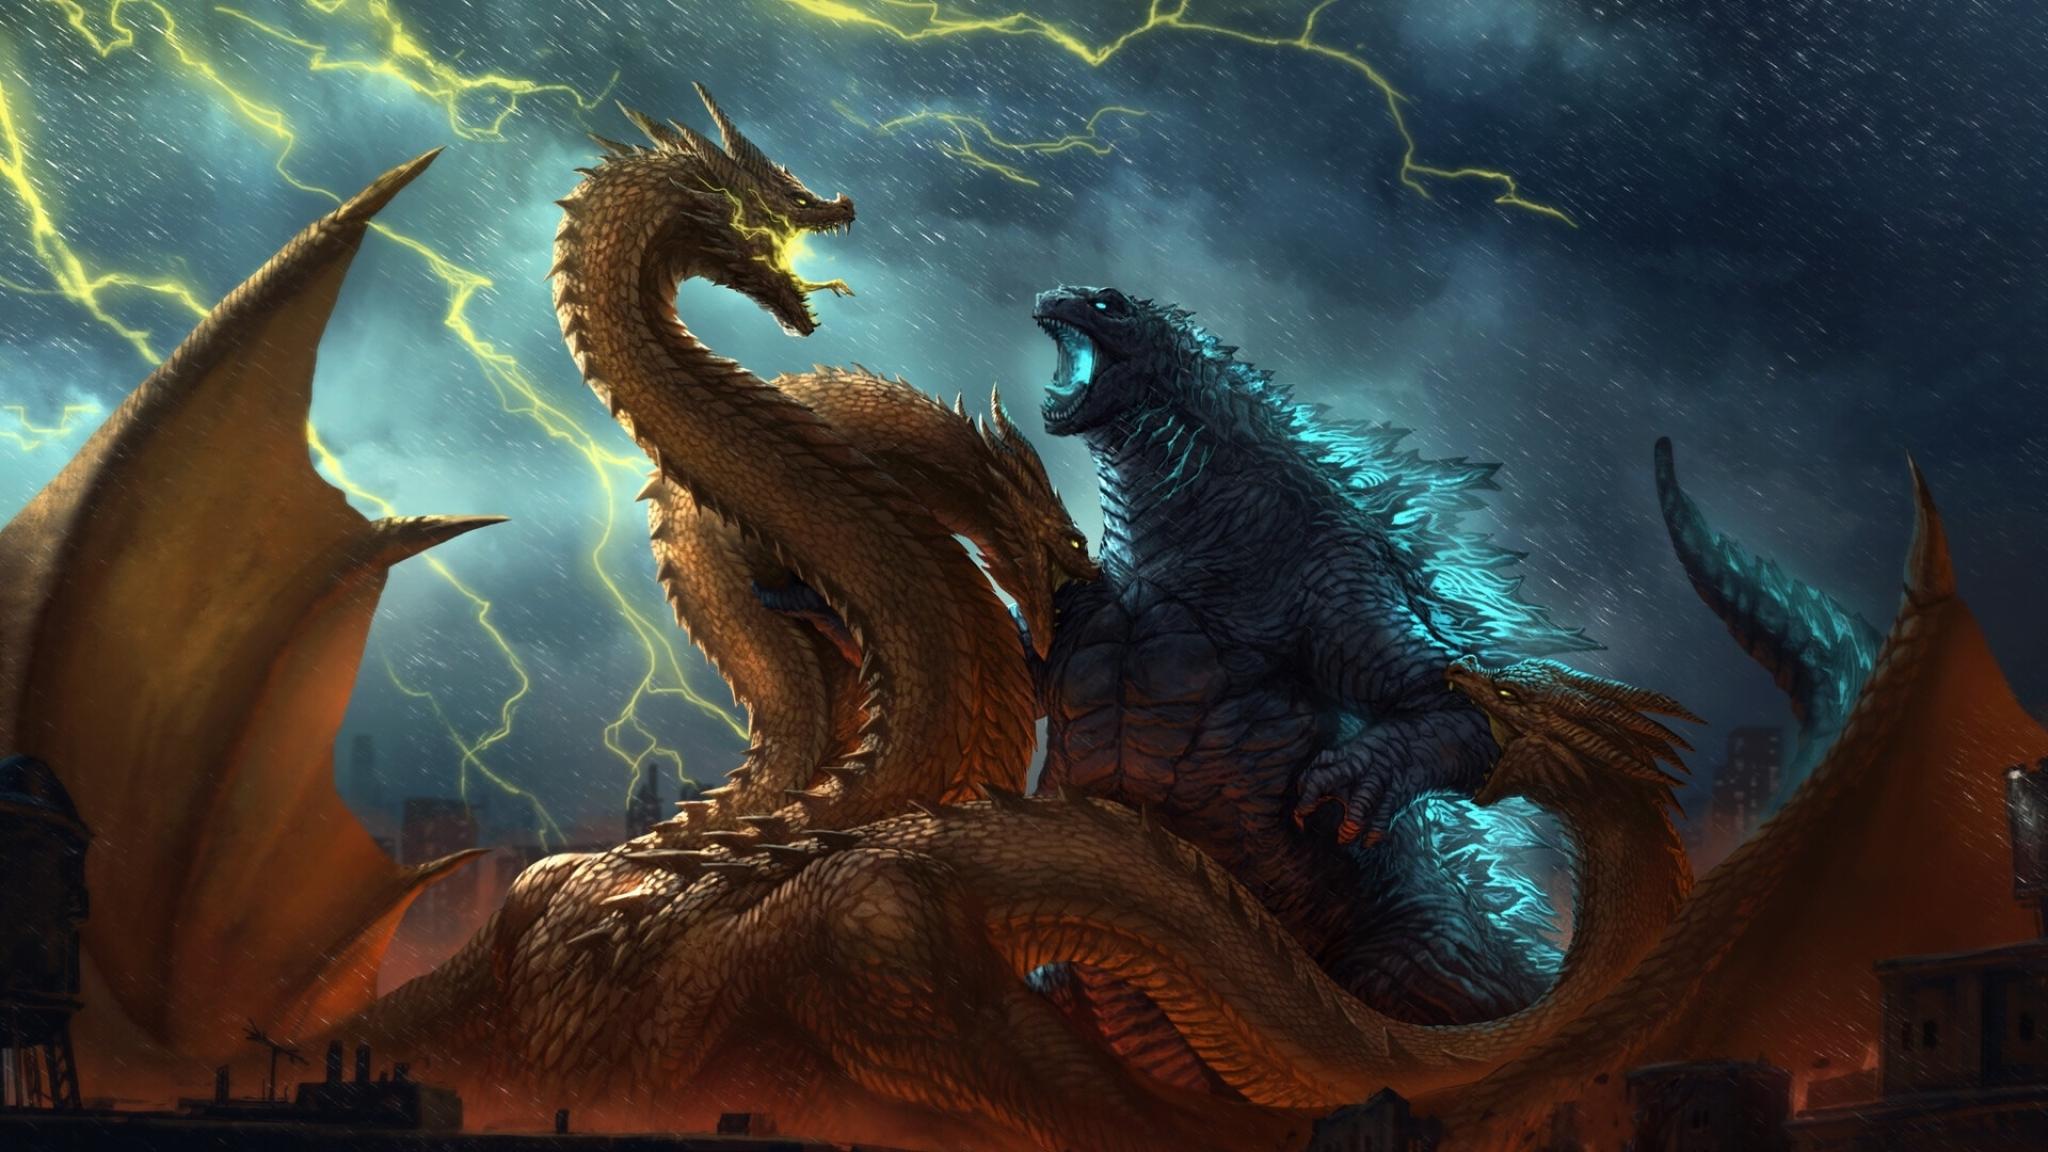 2048x1152 Godzilla vs King Ghidorah King of the Monsters ...